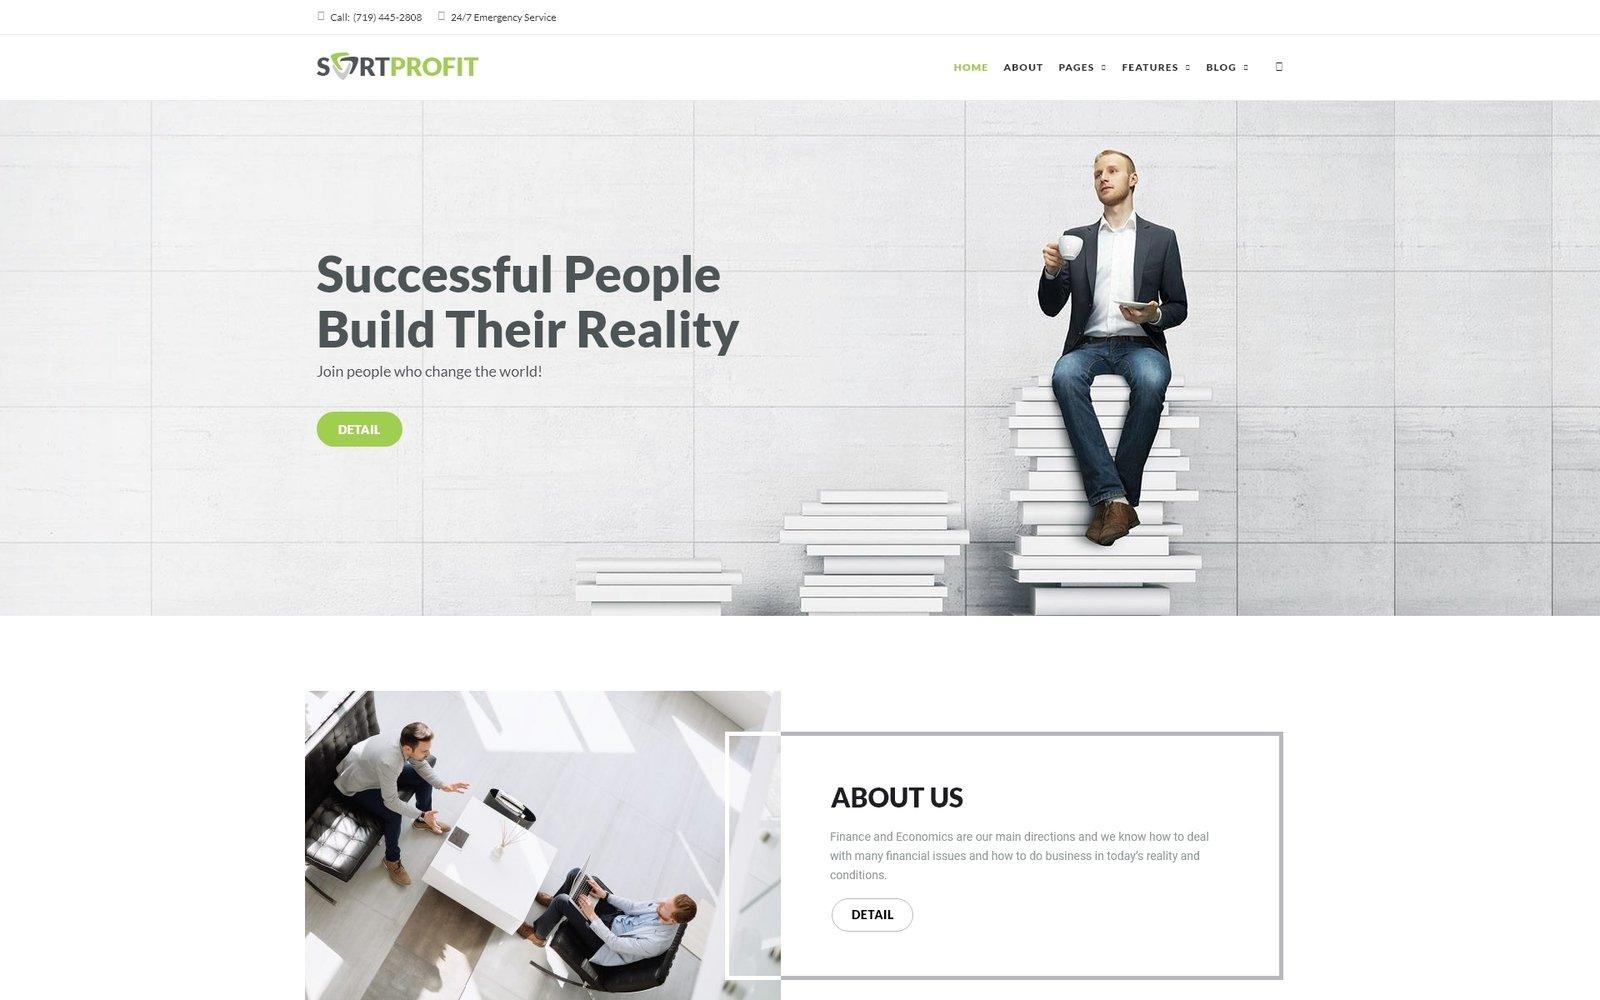 SortProfit - Business & Finance WordPress Theme №65113 - скриншот